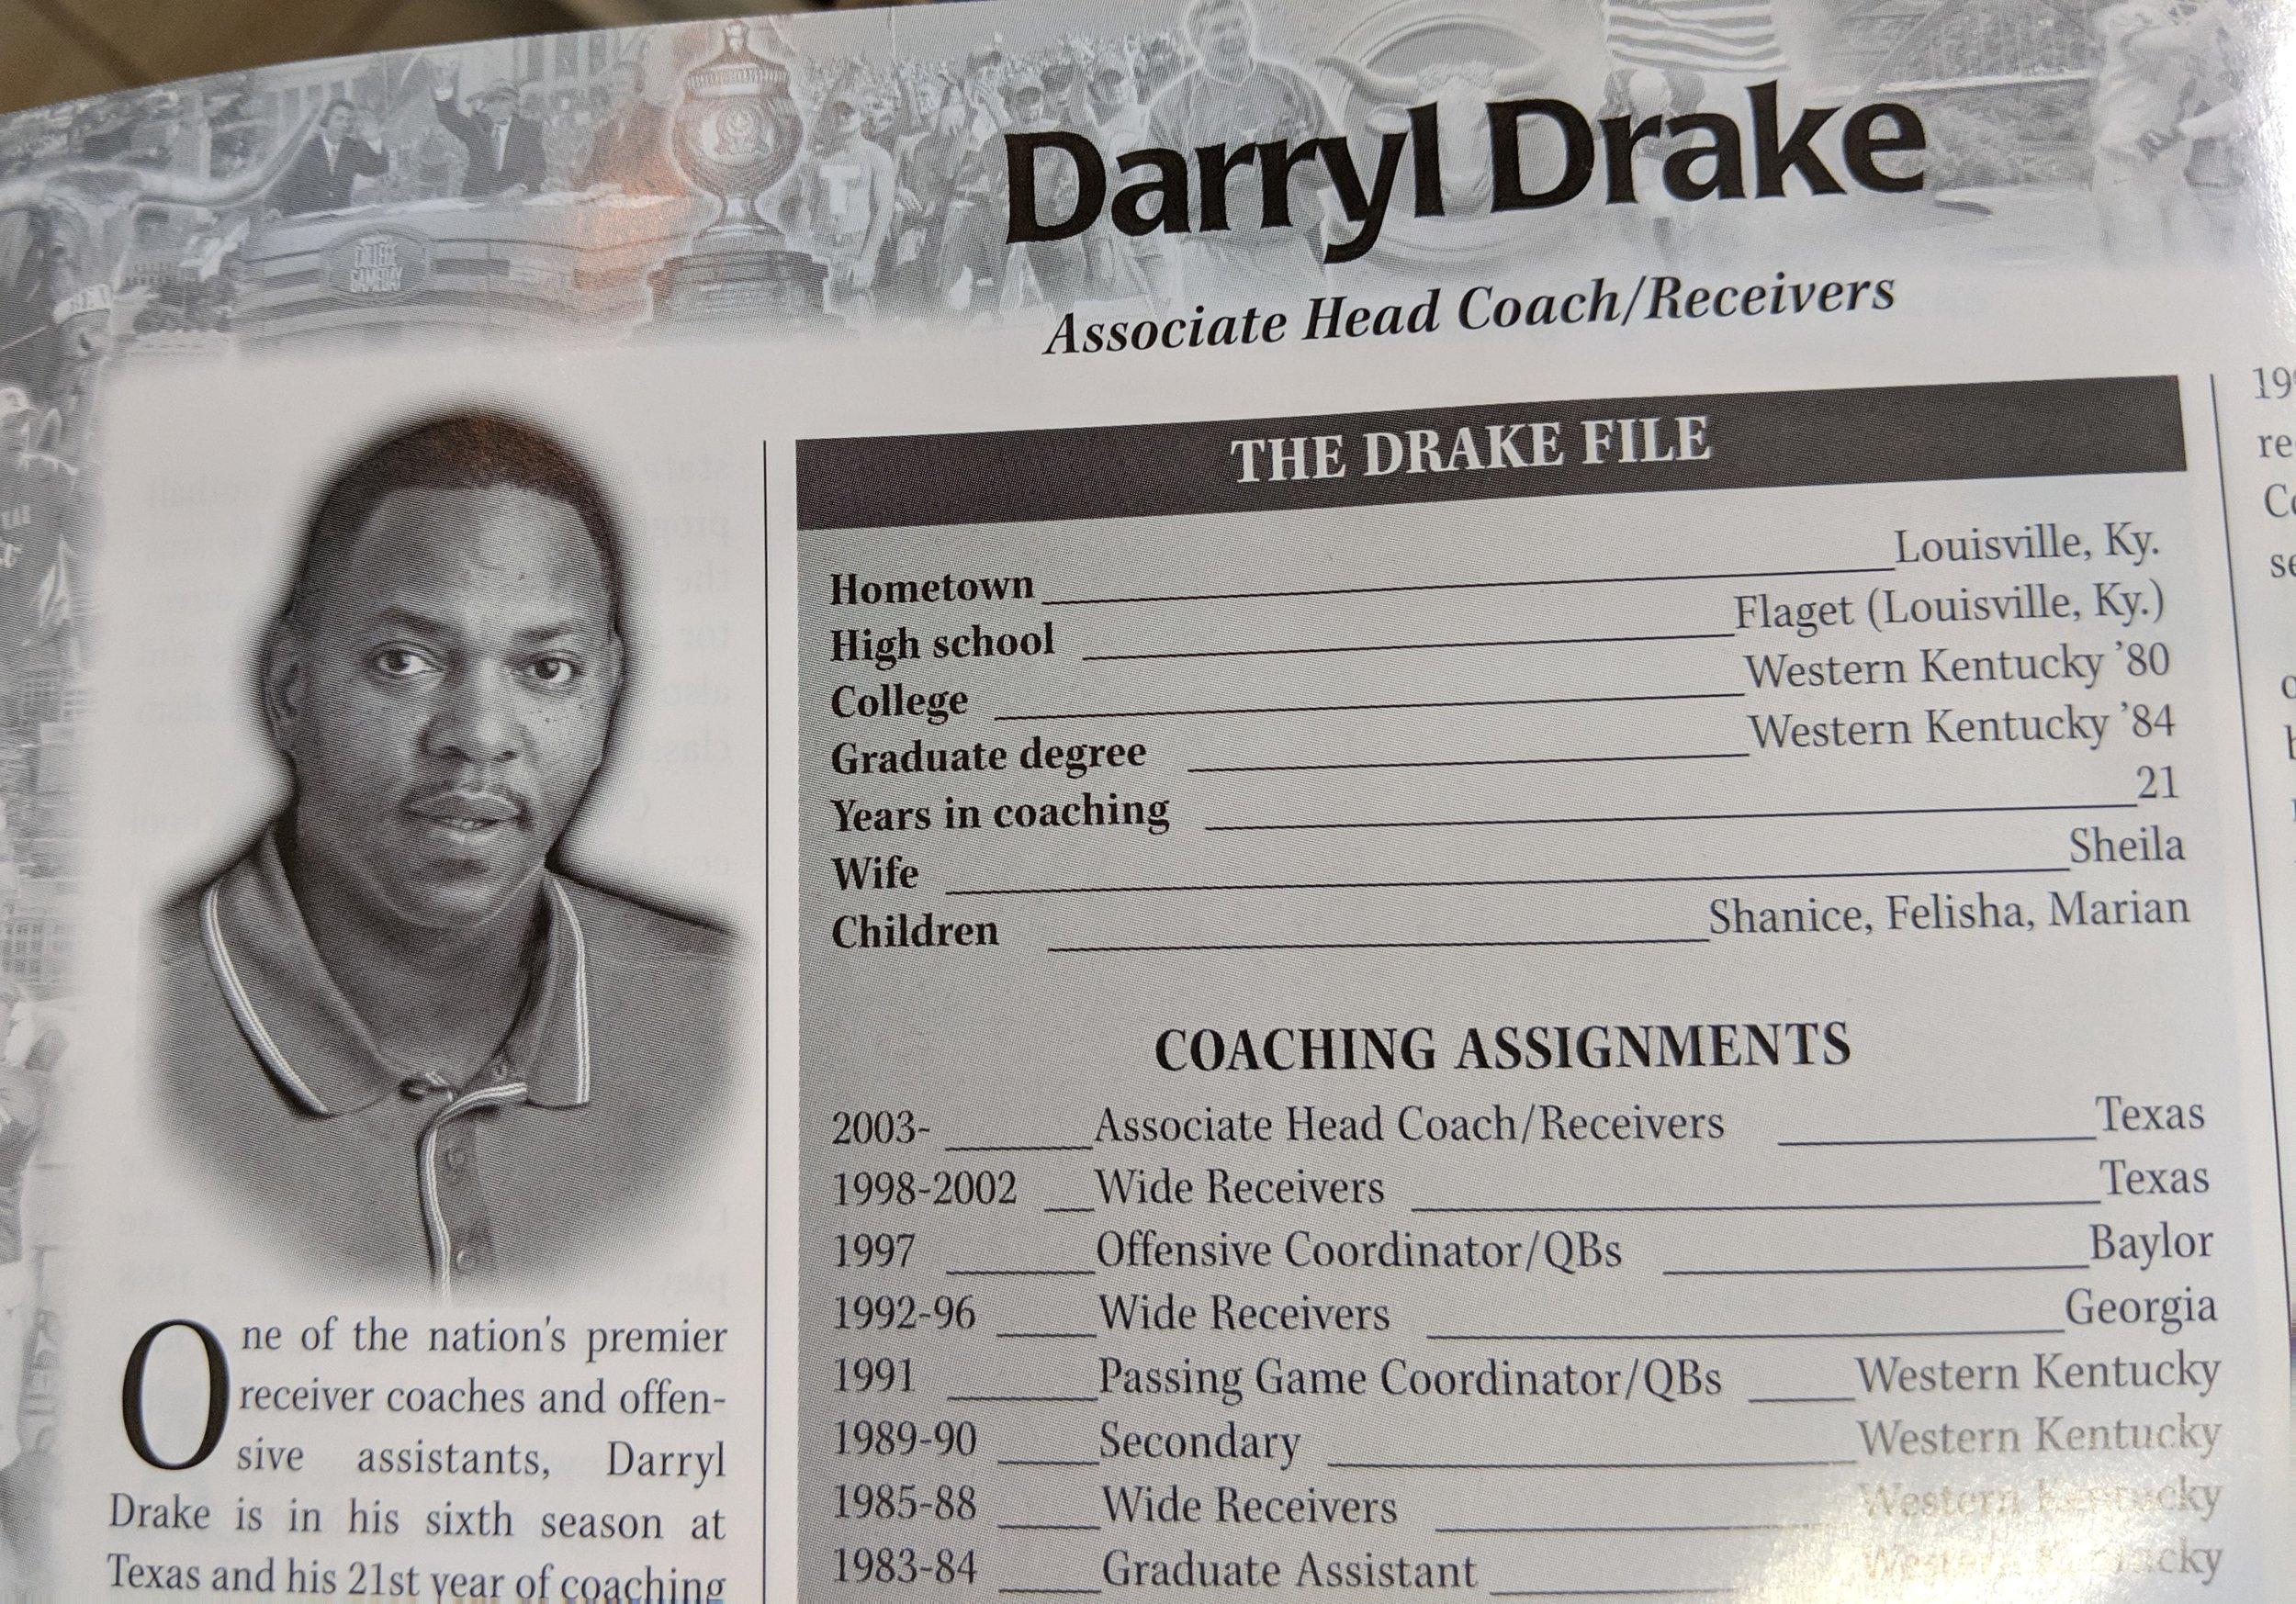 2003 Darryl Drake.jpg